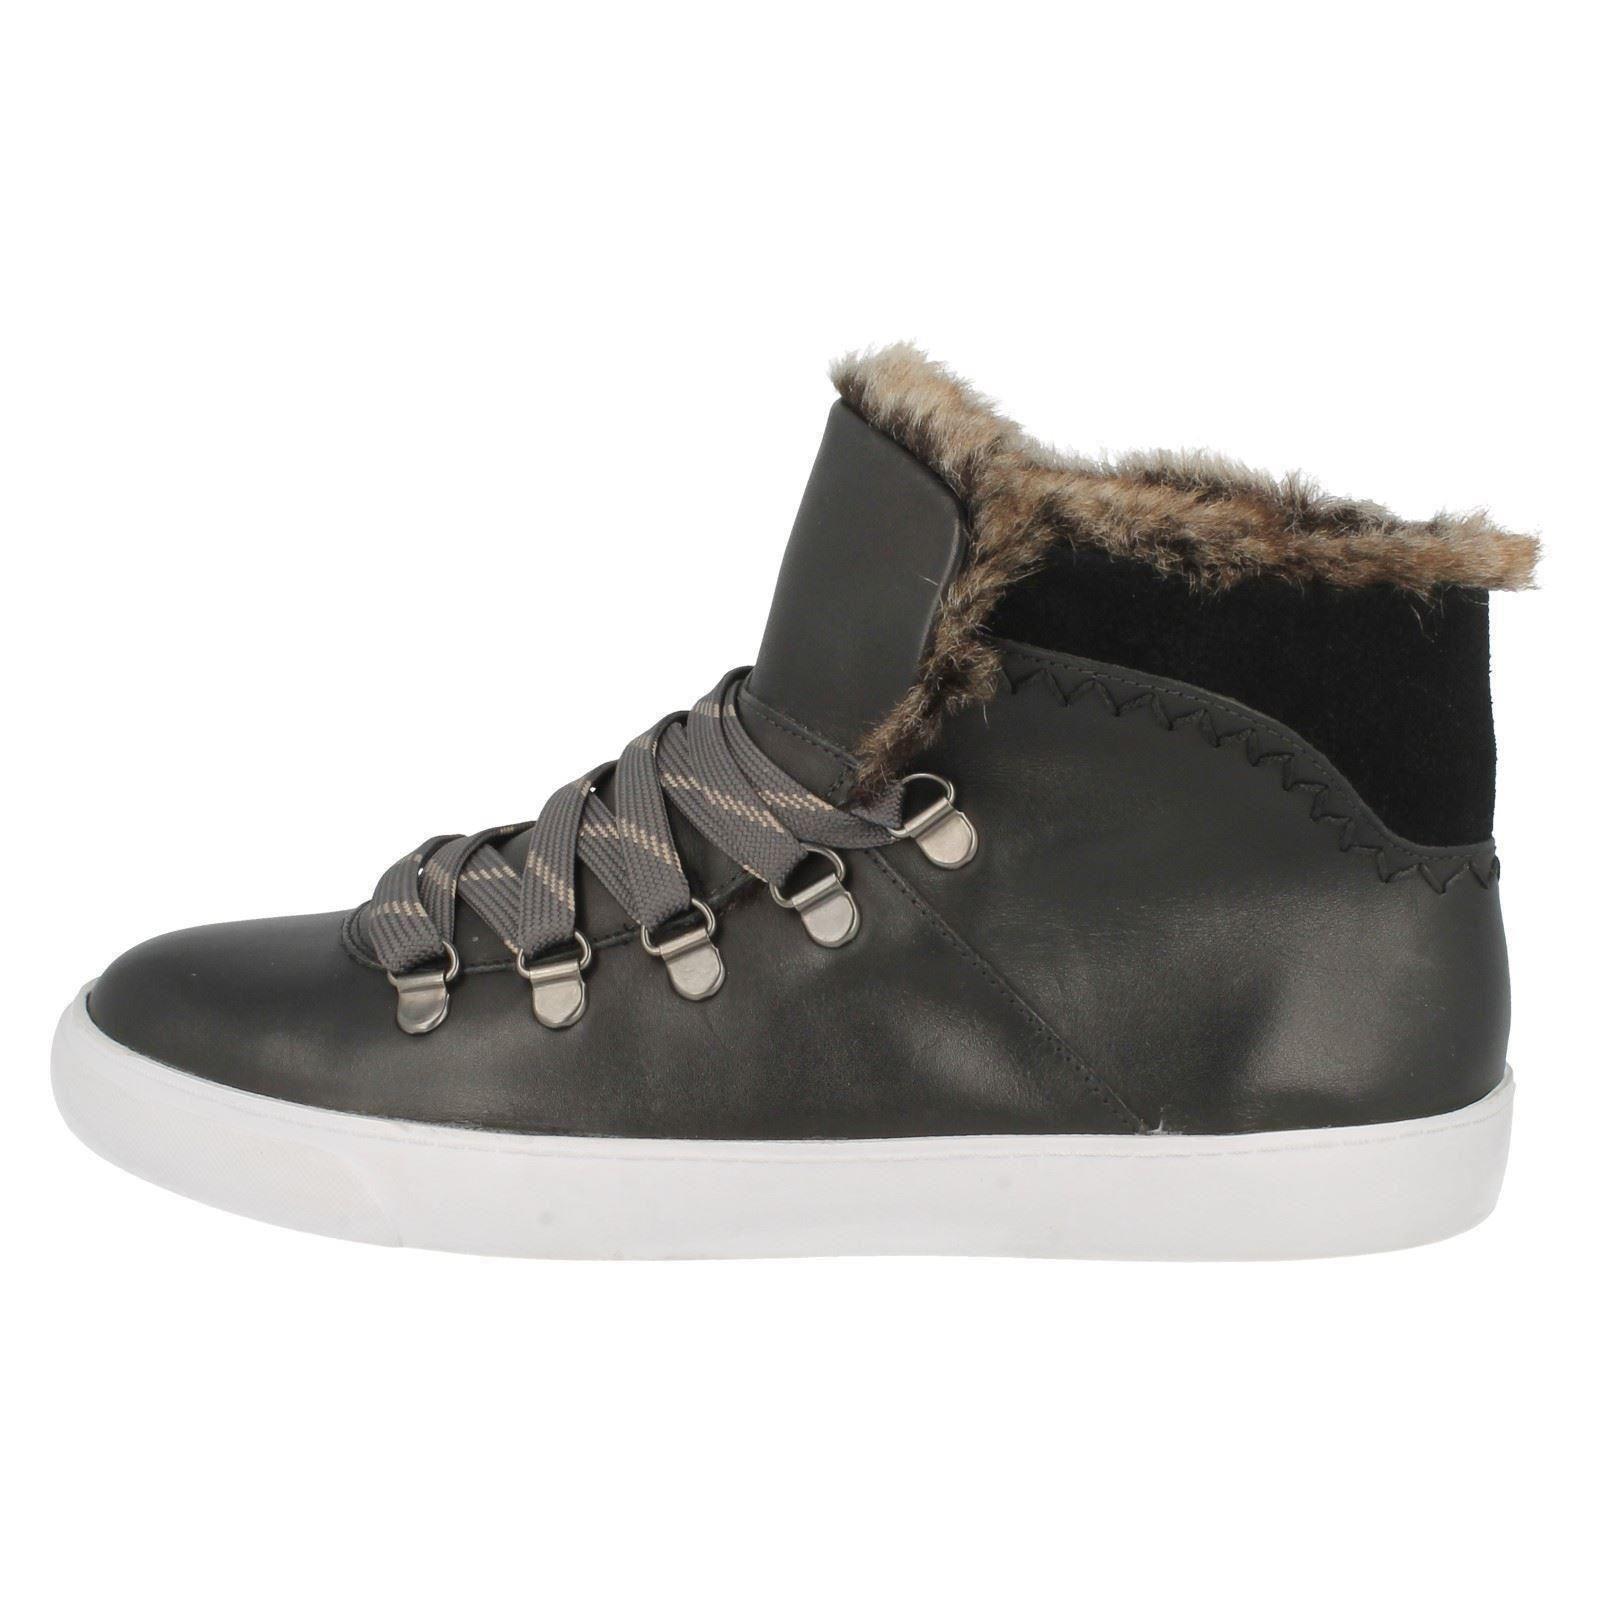 Maribel Hi Glove top deportivas Zapatillas Clarks Señoras negras HtxwUq5C